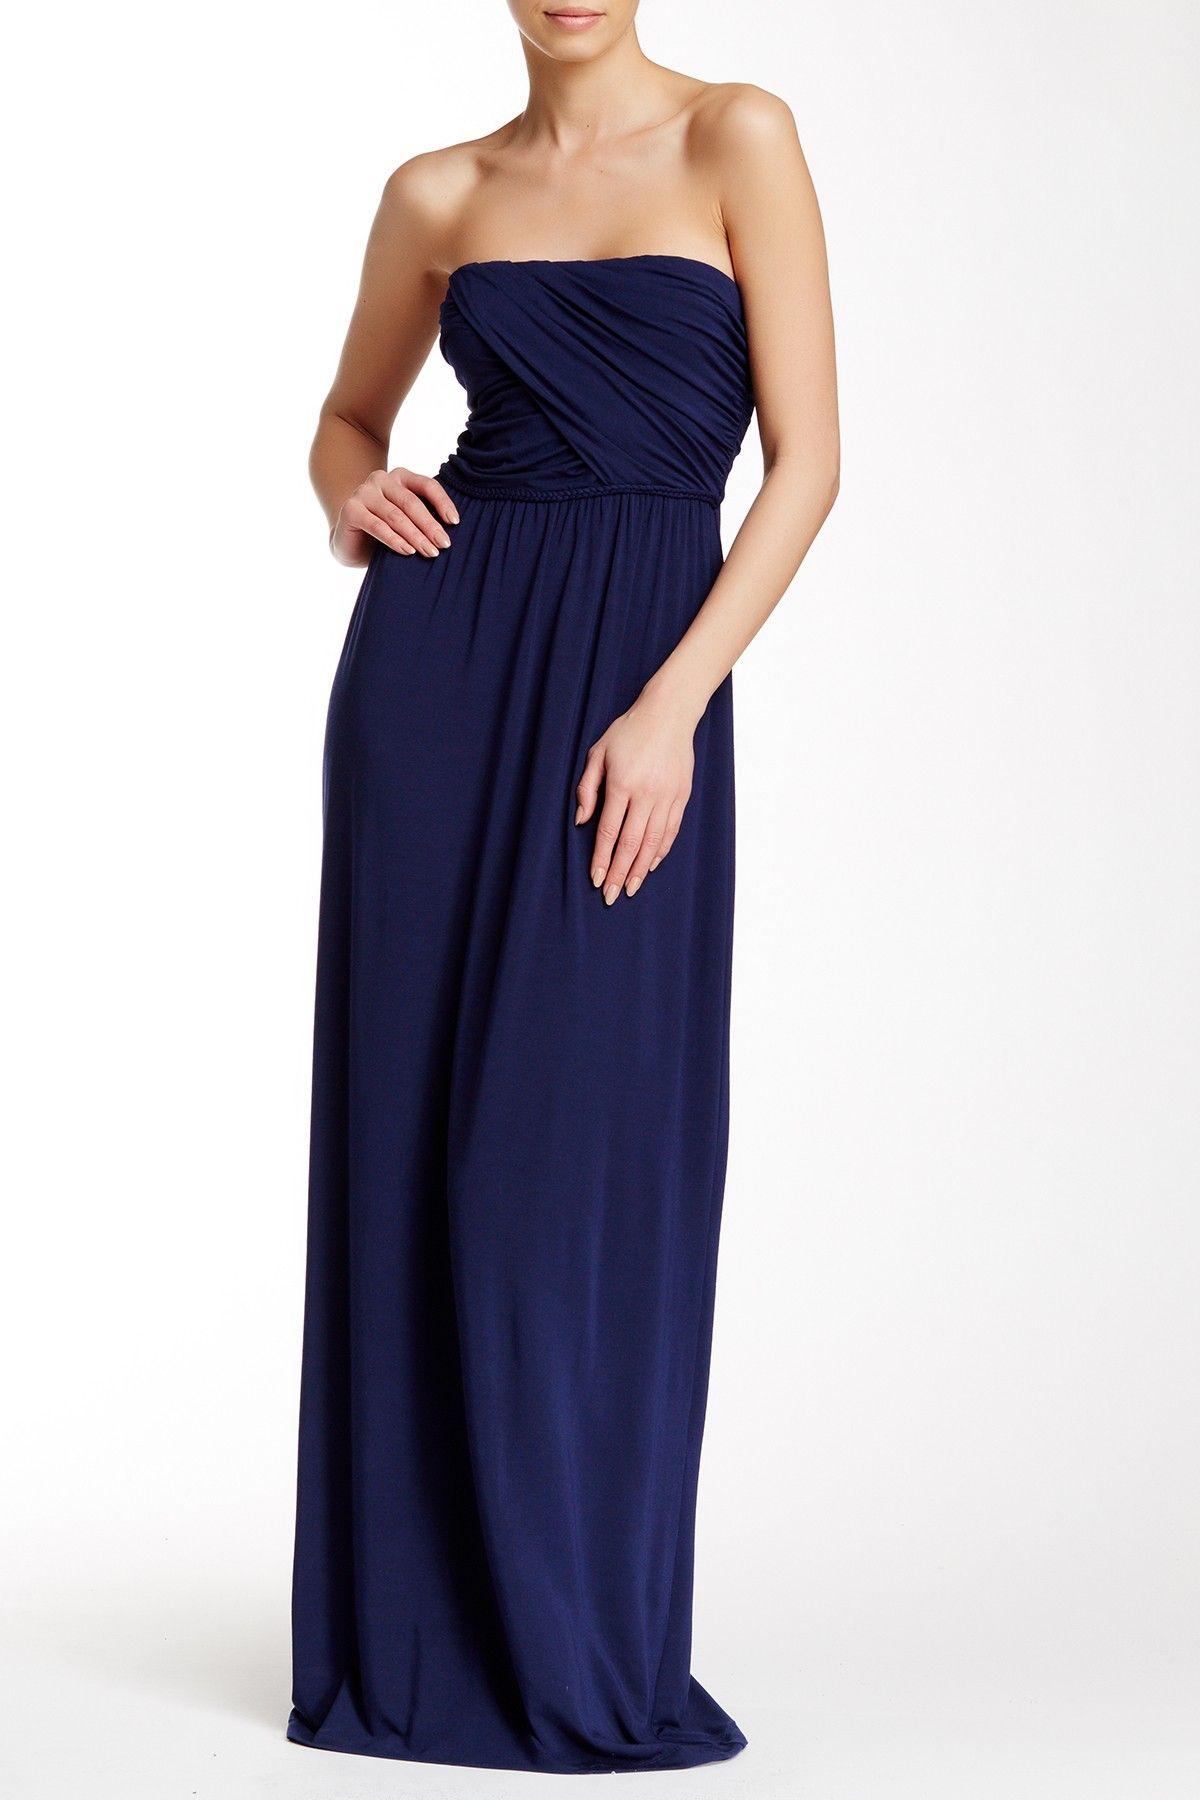 ddf6ba781623 Nordstrom Rack Plus Size Evening Dresses | Saddha